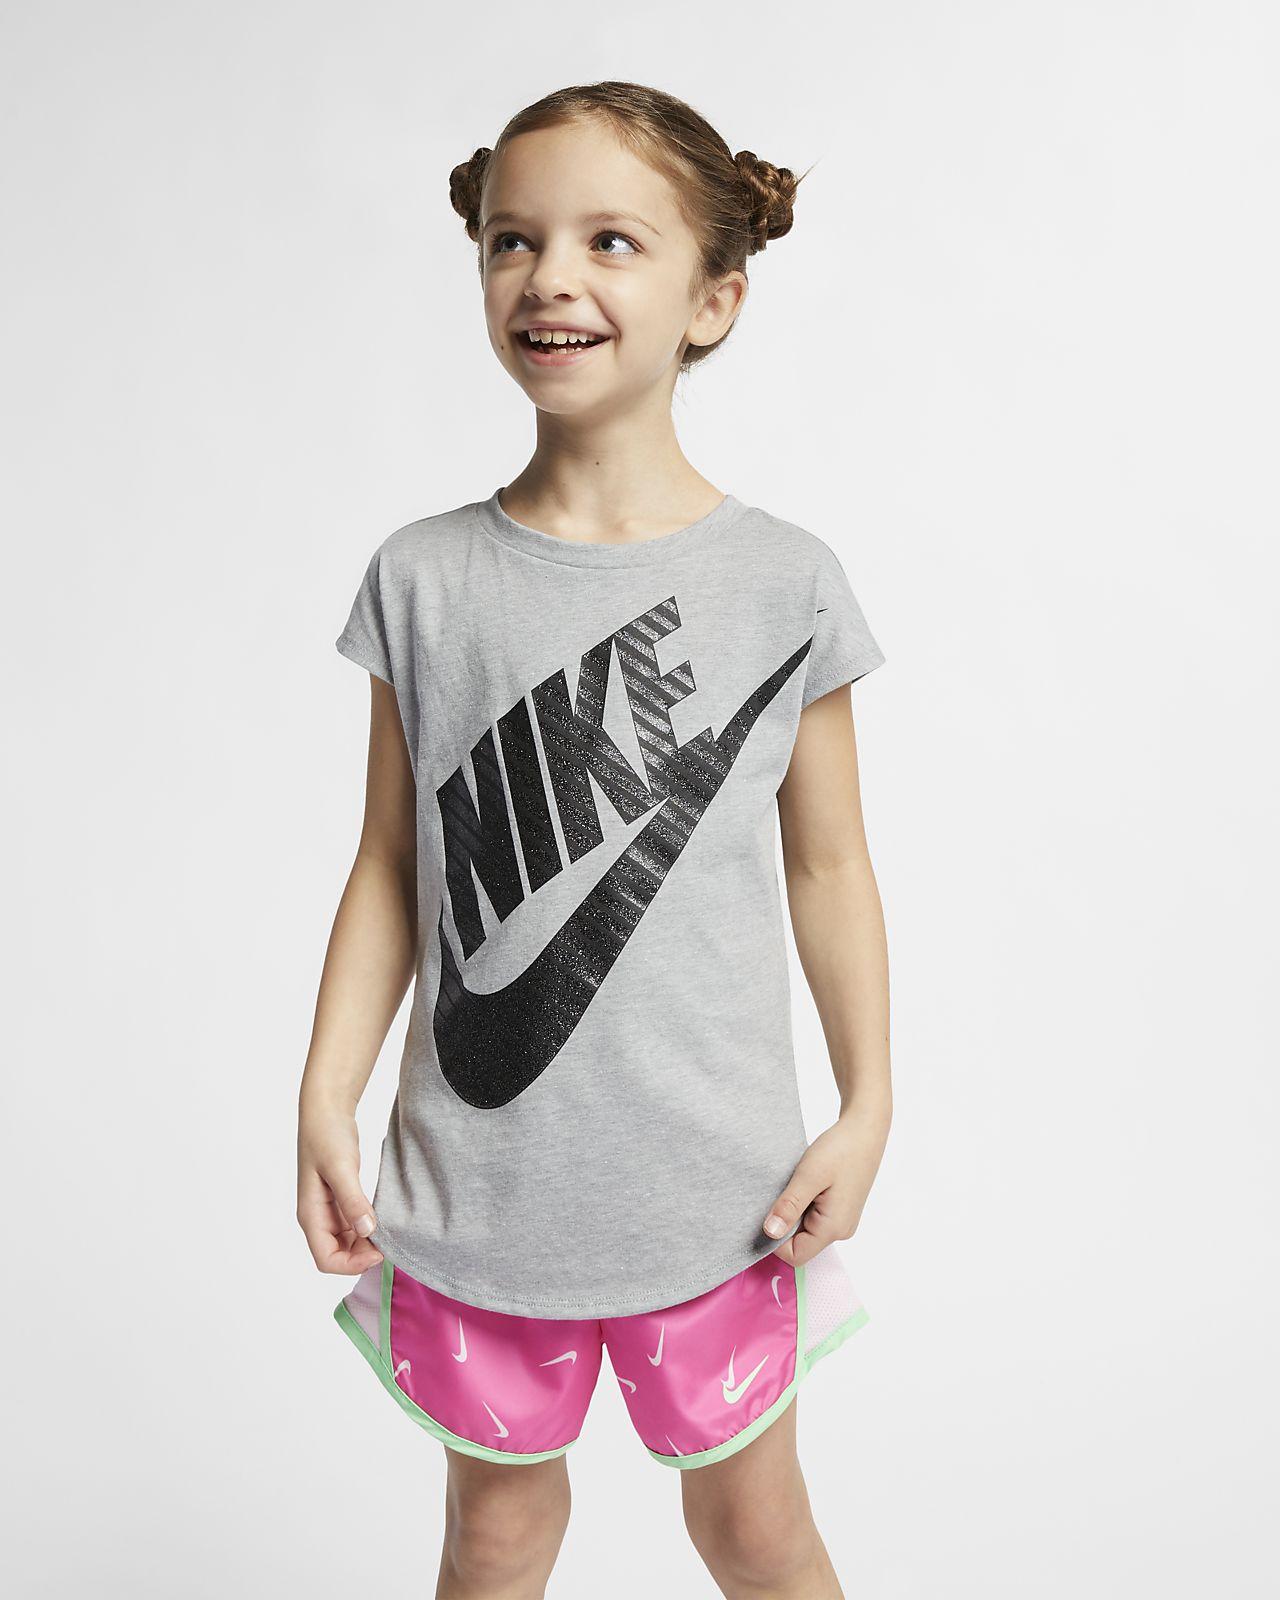 Nike Sportswear T-Shirt für jüngere Kinder